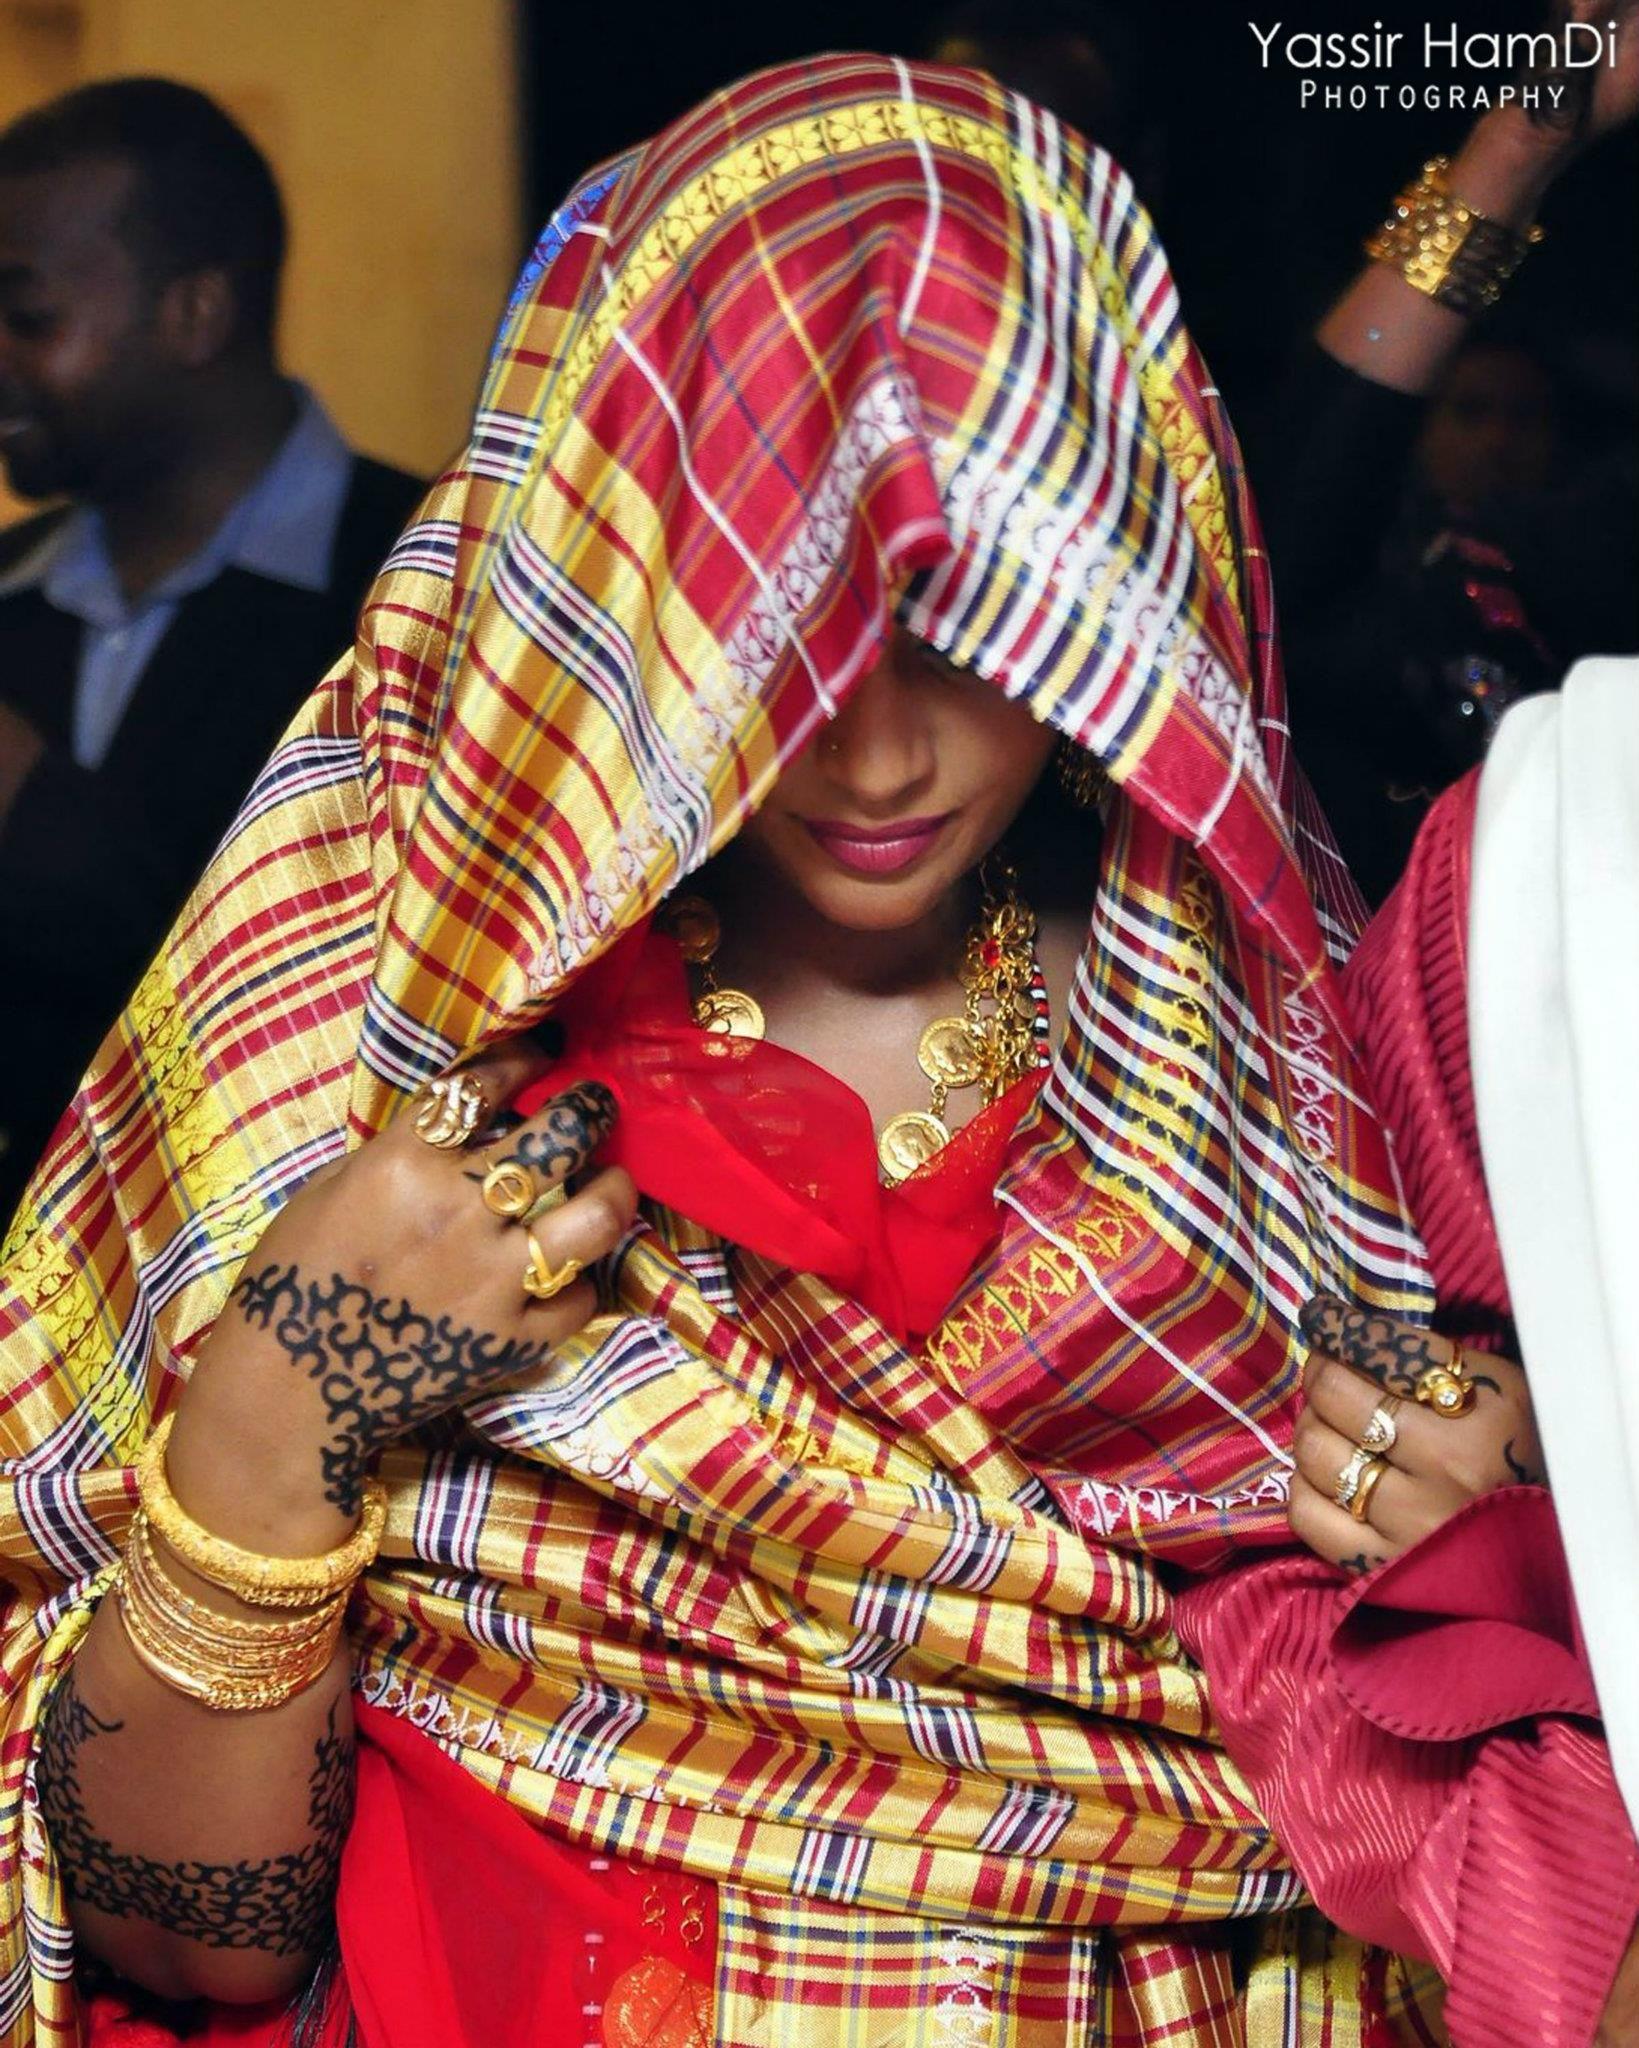 Sudanese wedding rituals and traditions - Beautifuleastafricanbrides Beautiful Sudani Bride In Traditional Attire